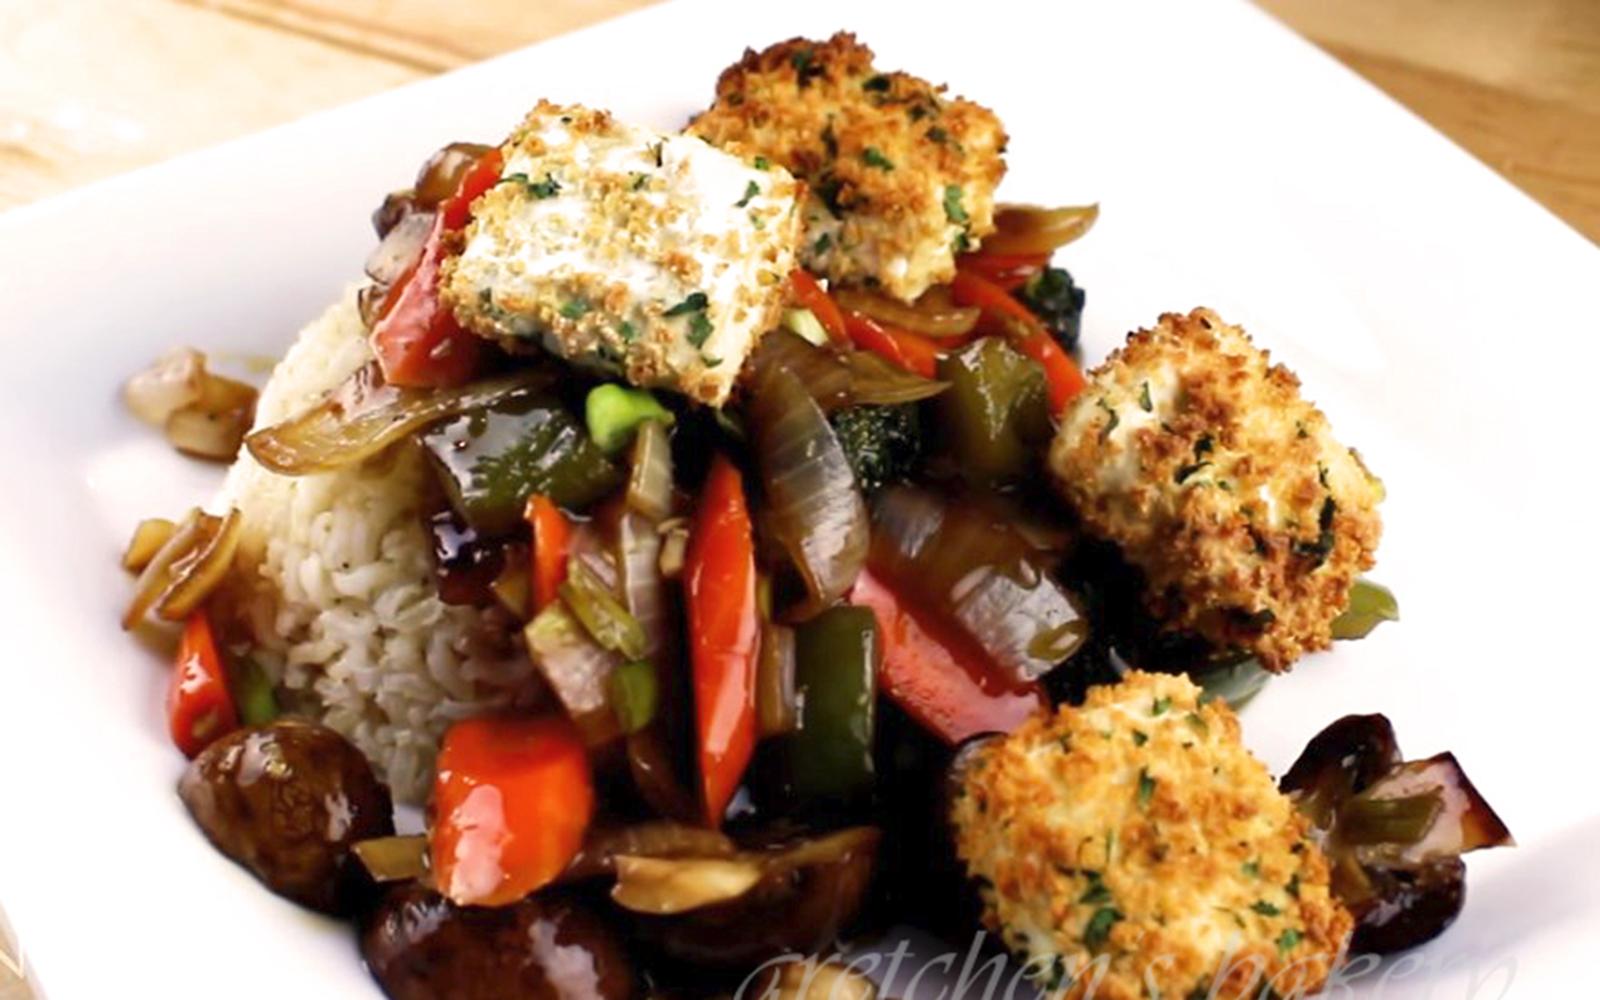 Crispy Tofu Vegetable Stir-Fry